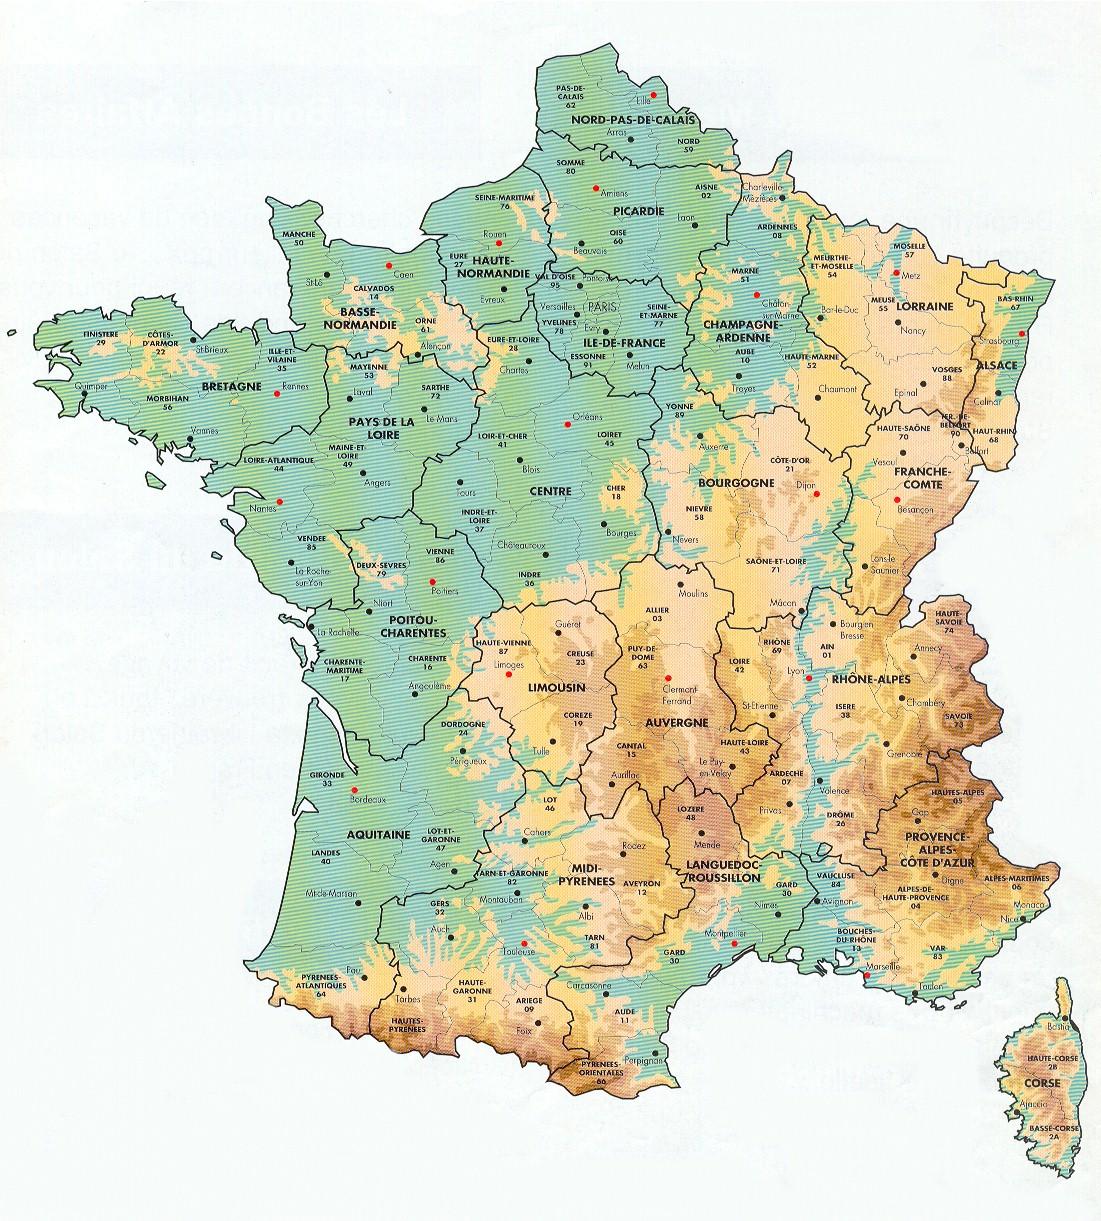 Mapa Regioes Franca